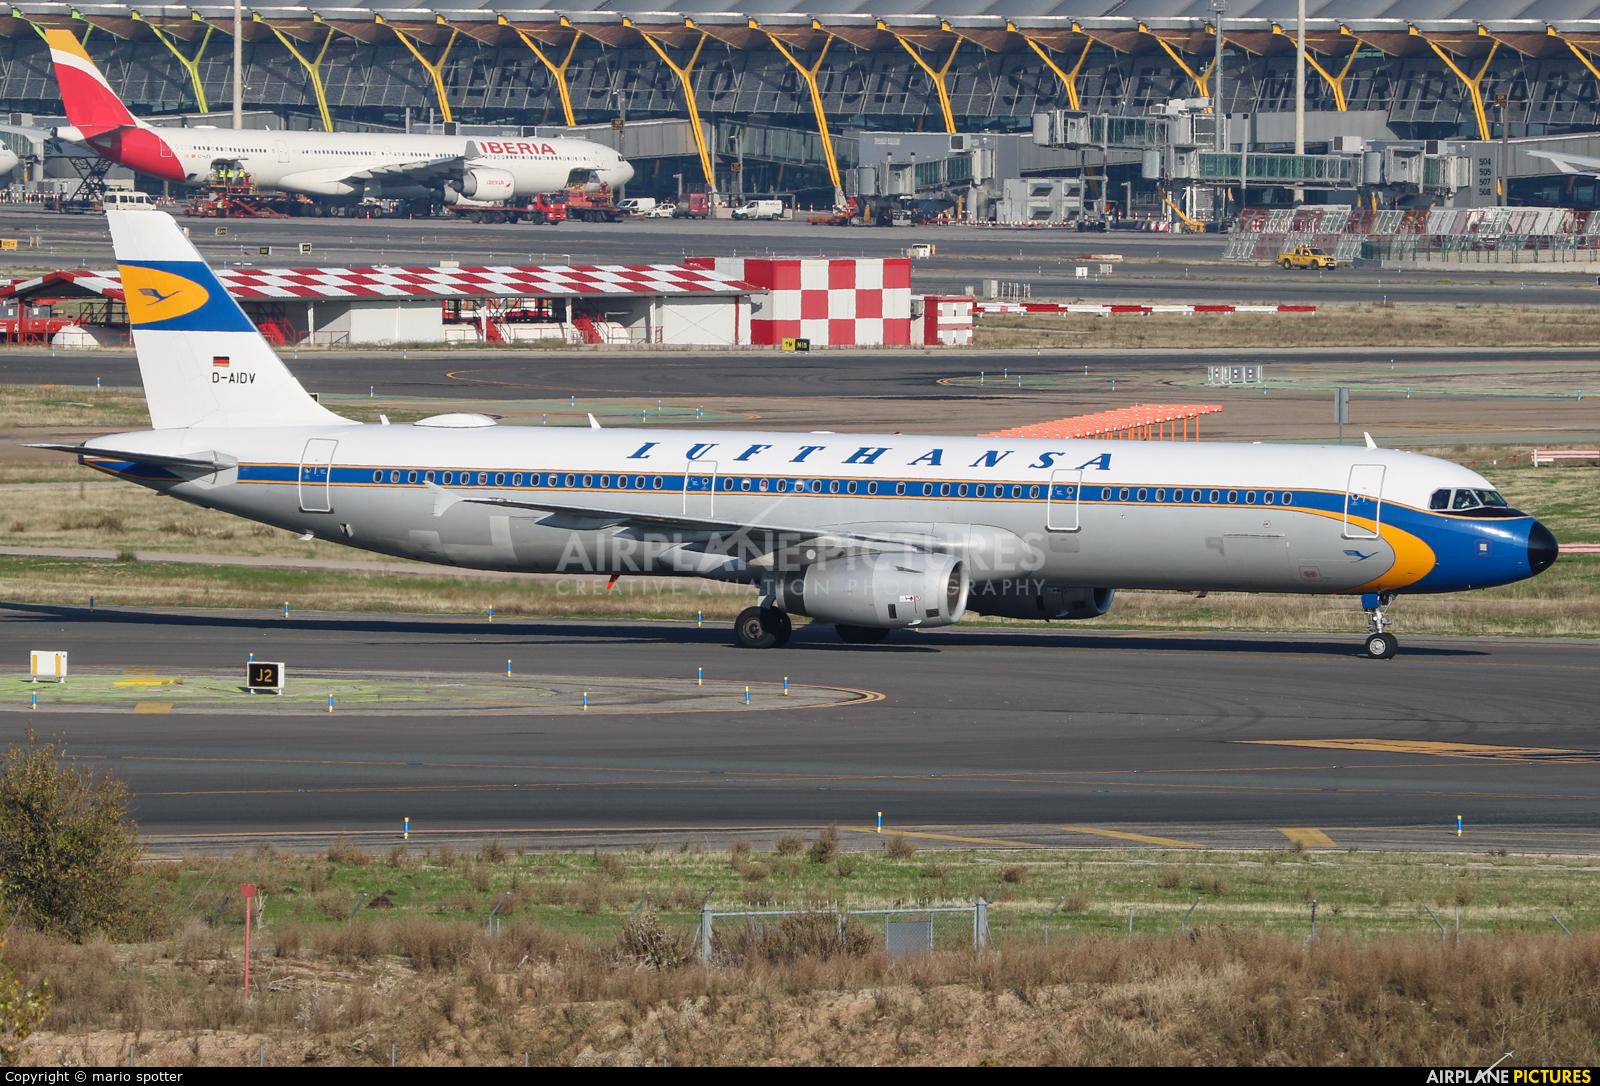 Lufthansa D-AIDV aircraft at Madrid - Barajas